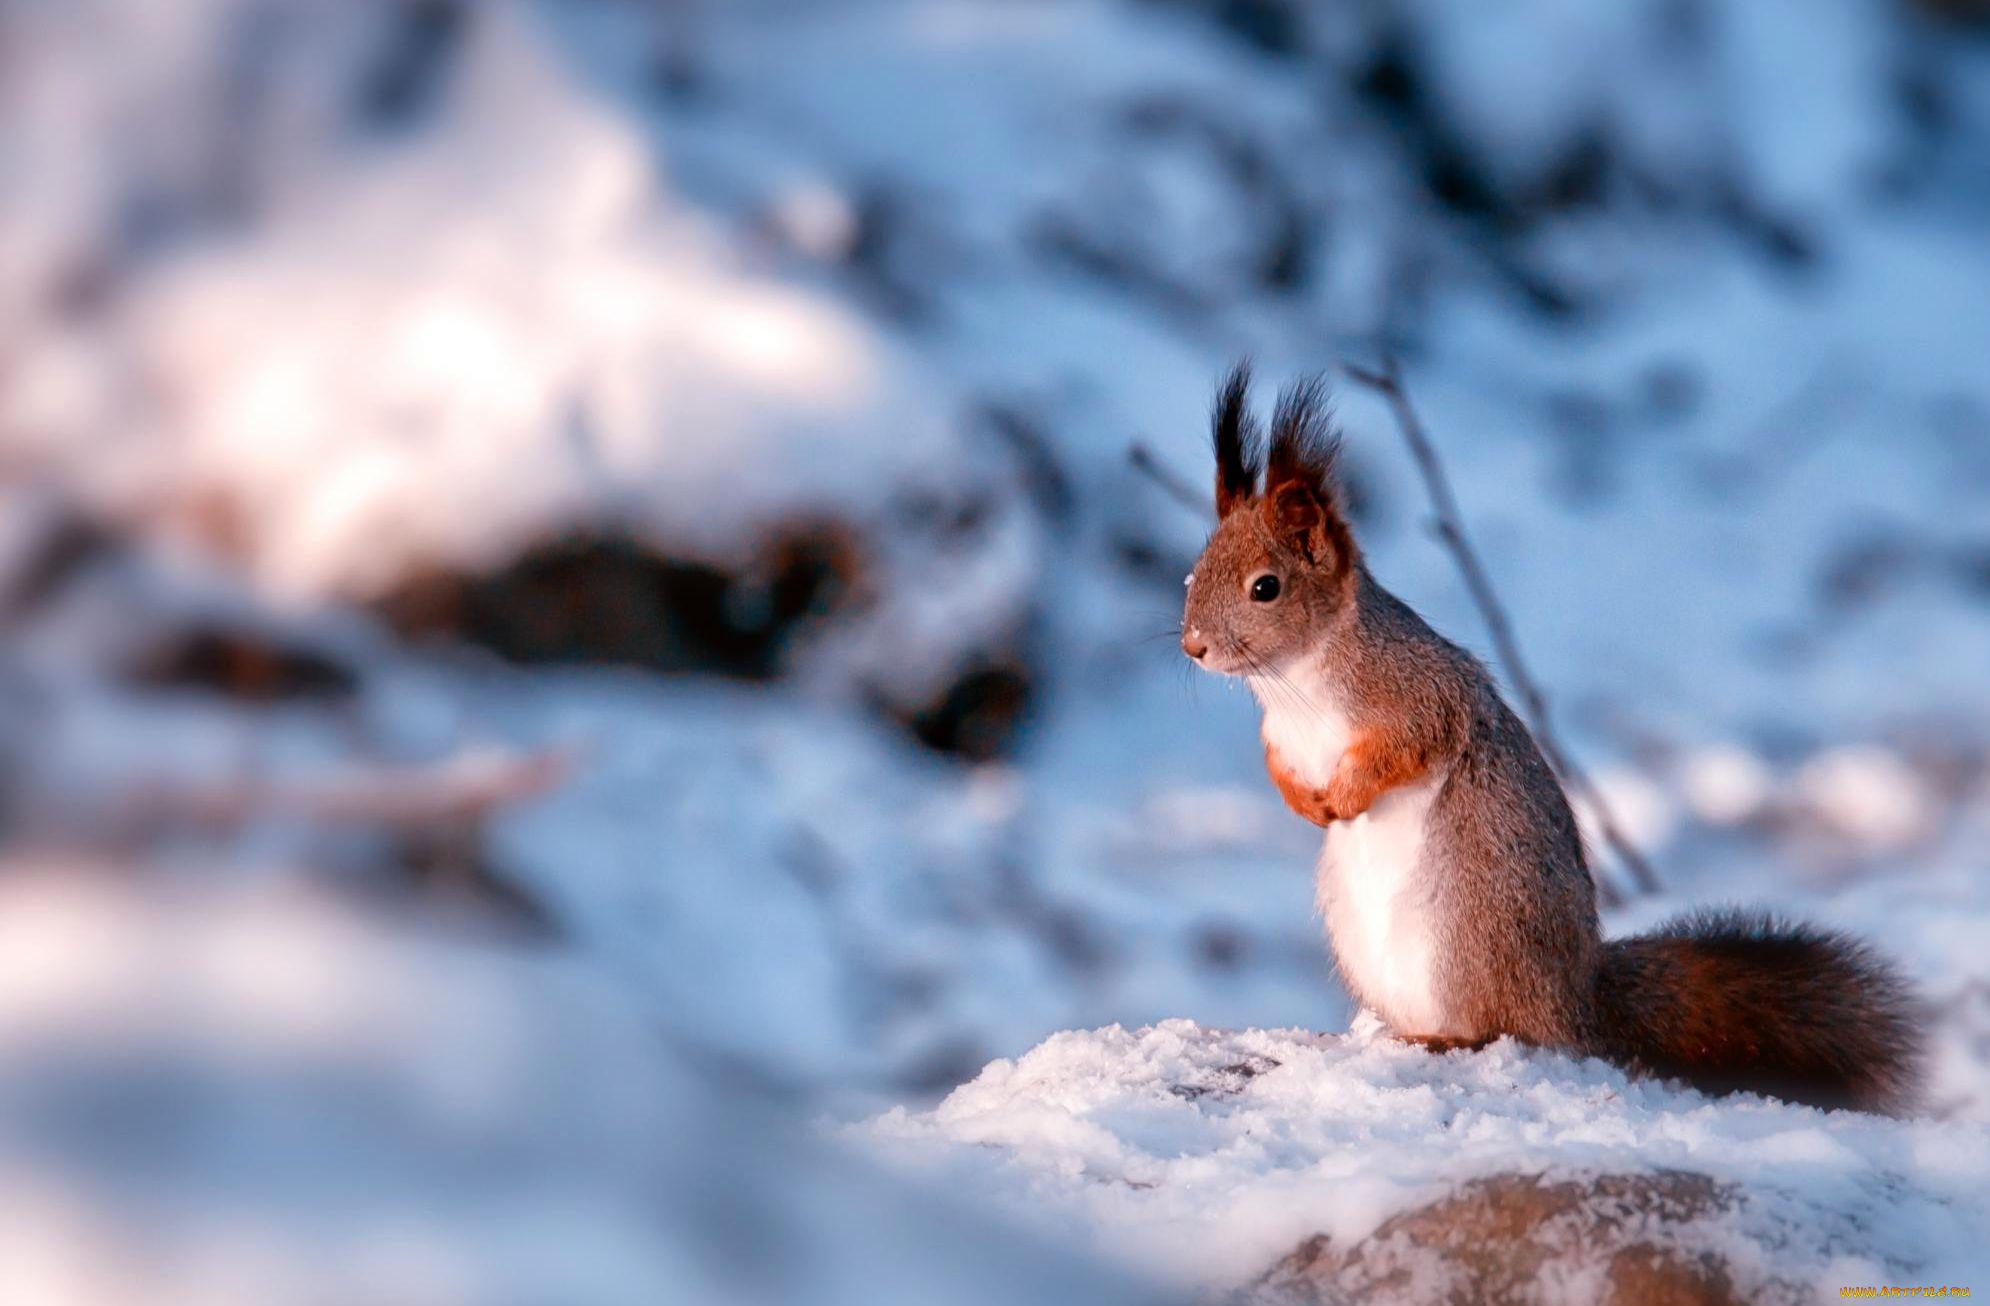 Картинки бельчонок на снегу